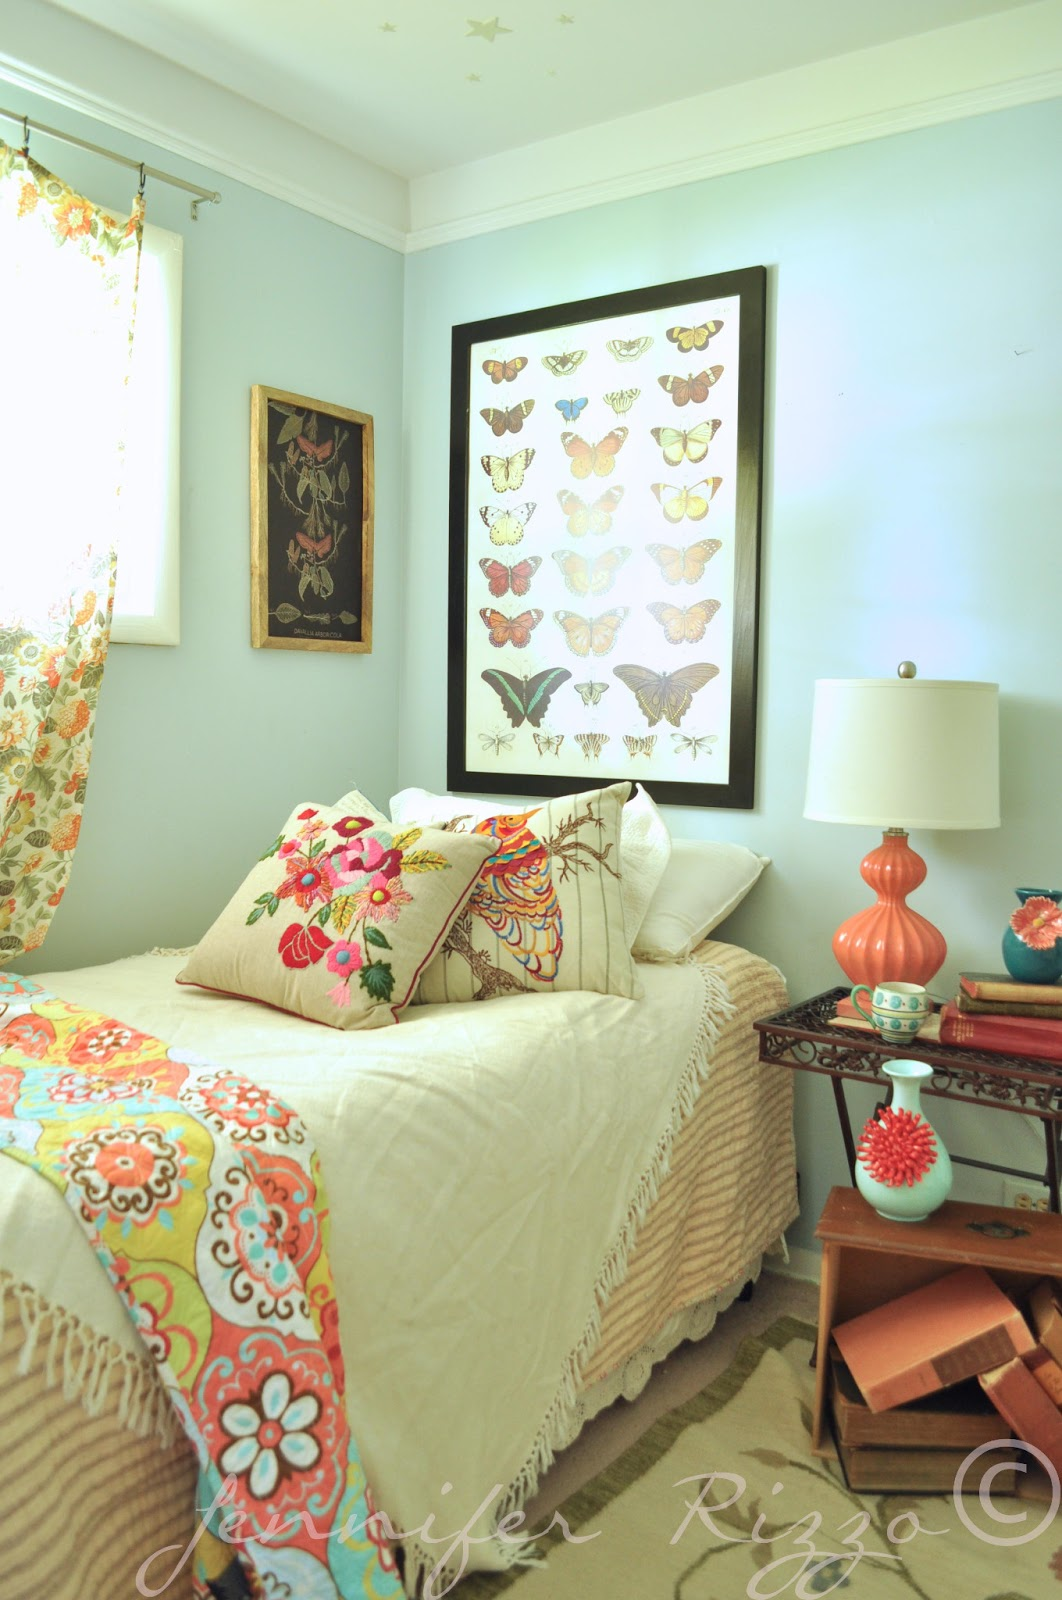 A Modern Bohemian Room U2026.One Room, Three Different Ways Day 2u2026